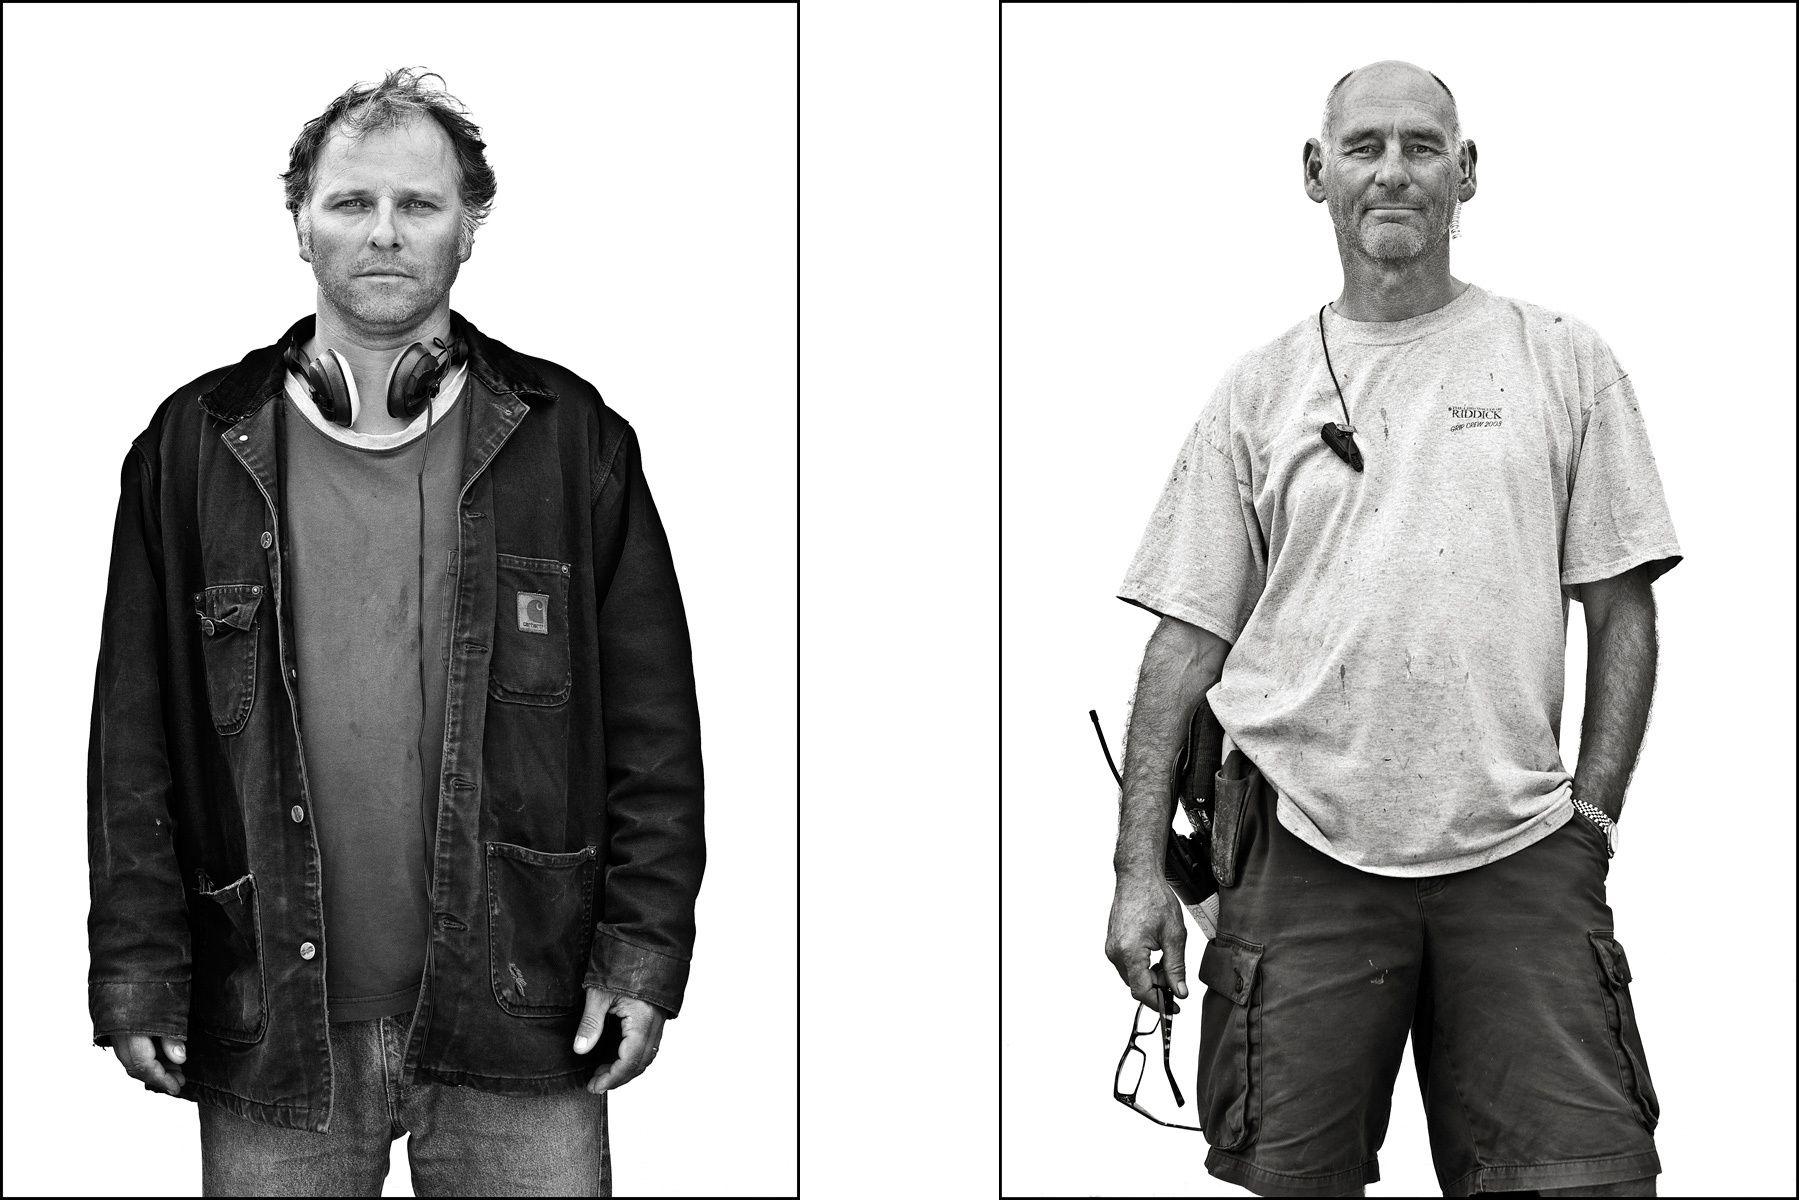 Rob sound & Tom standby paint